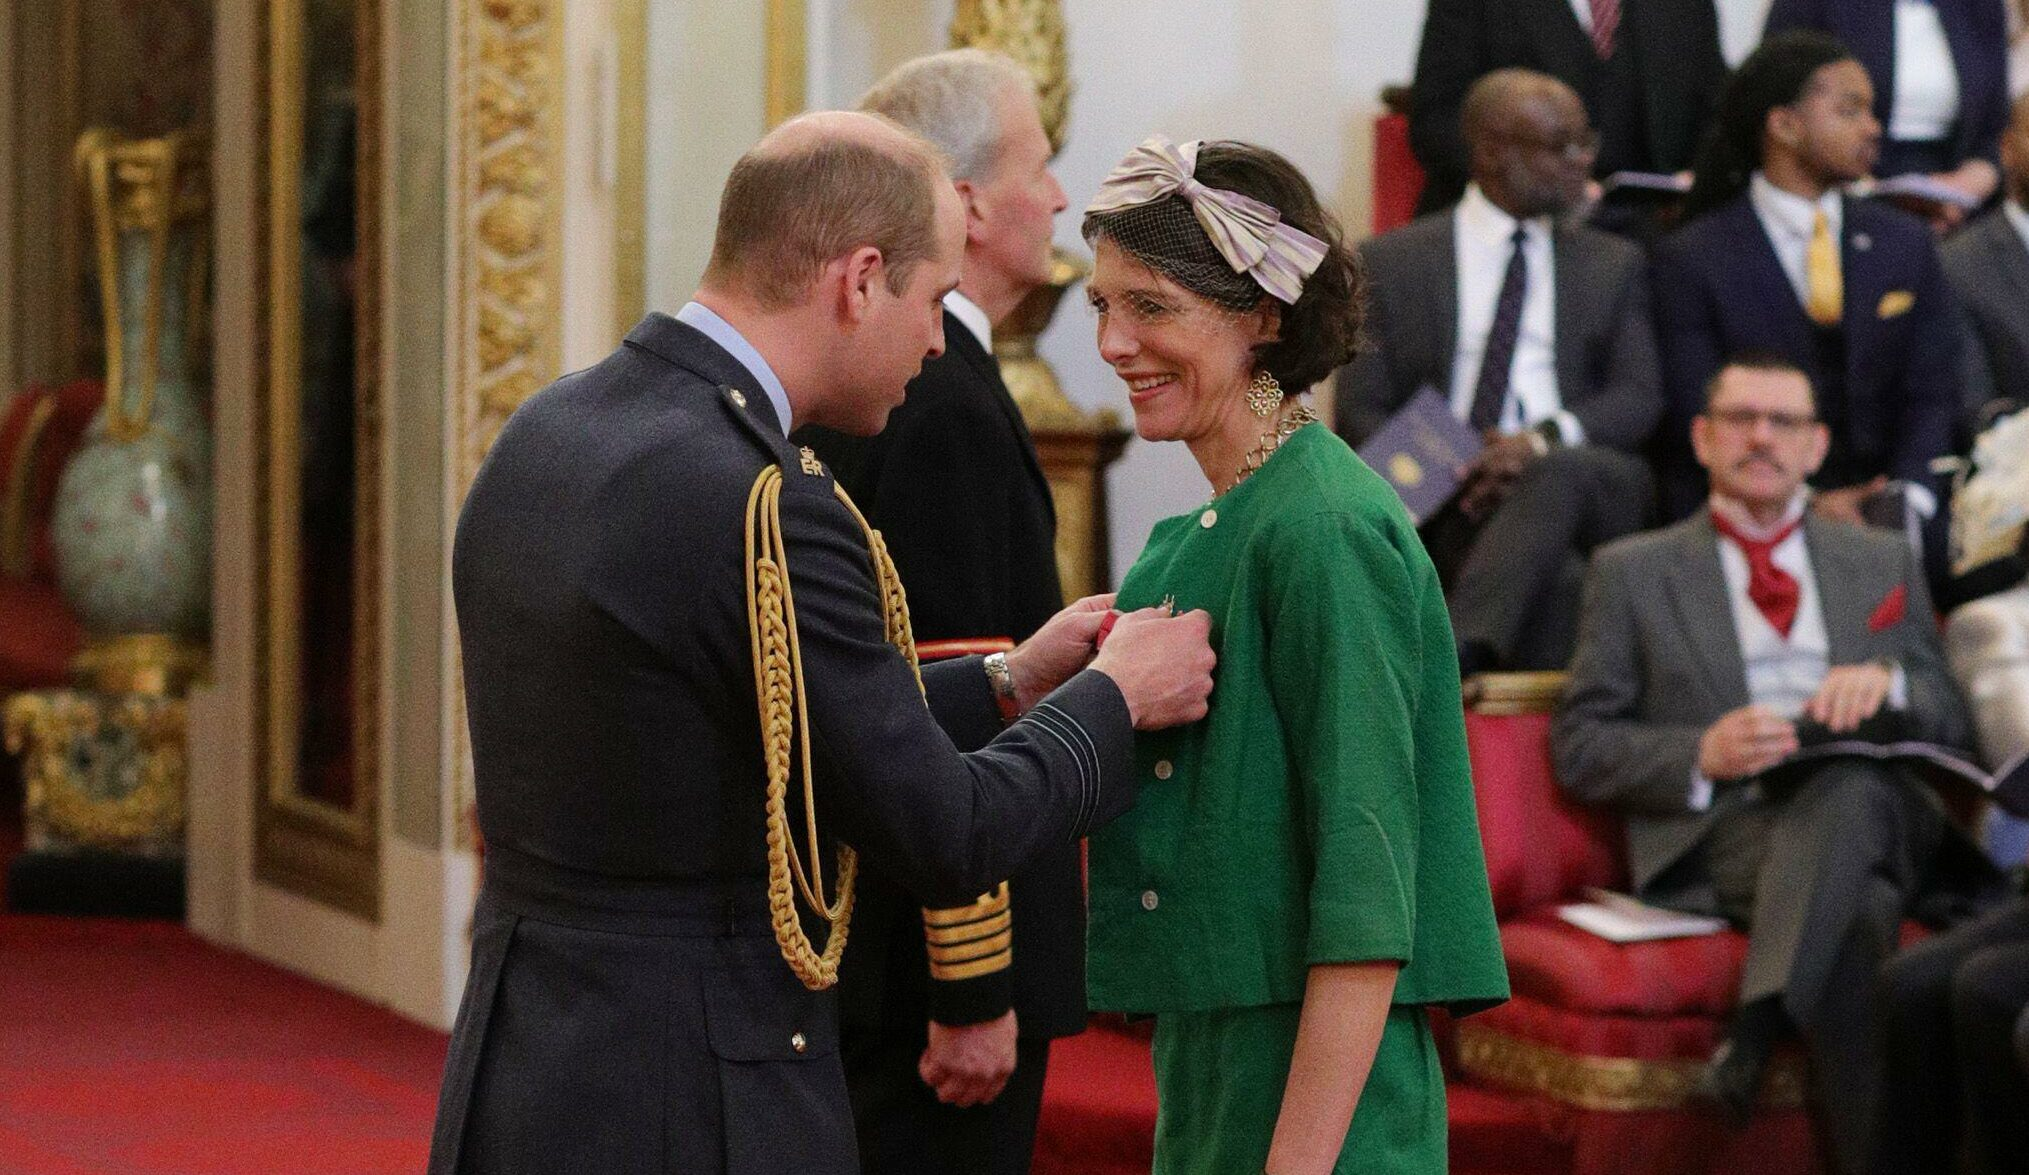 Thomasina Miers OBE